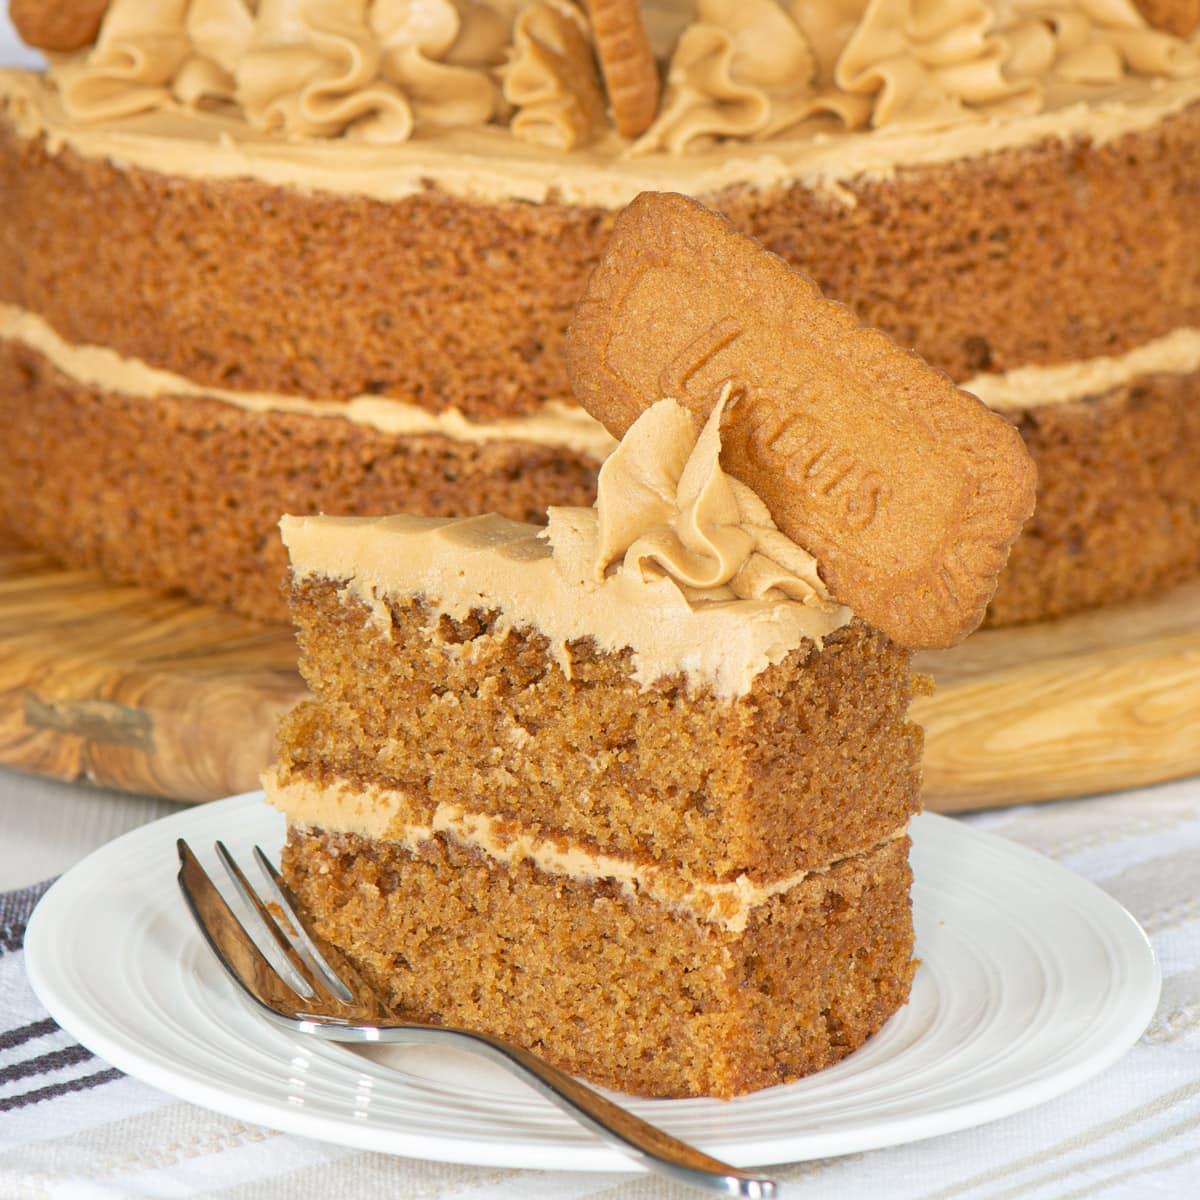 A slice of Biscoff cake.